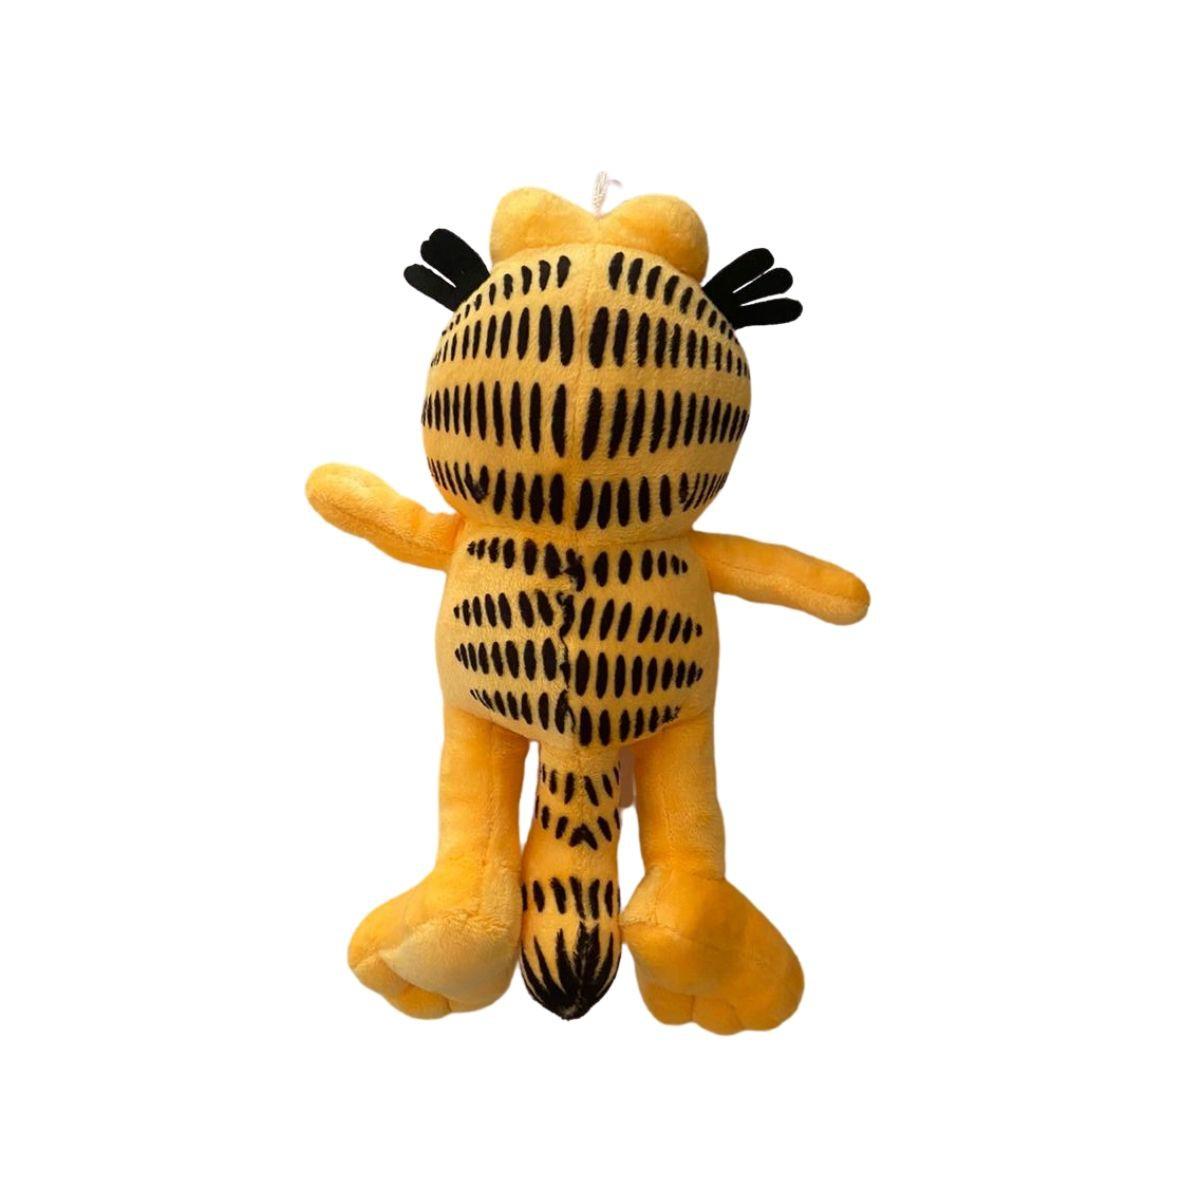 Garfield Pelucia Gato de Pendurar 25 cm Envio Imediato  - Game Land Brinquedos